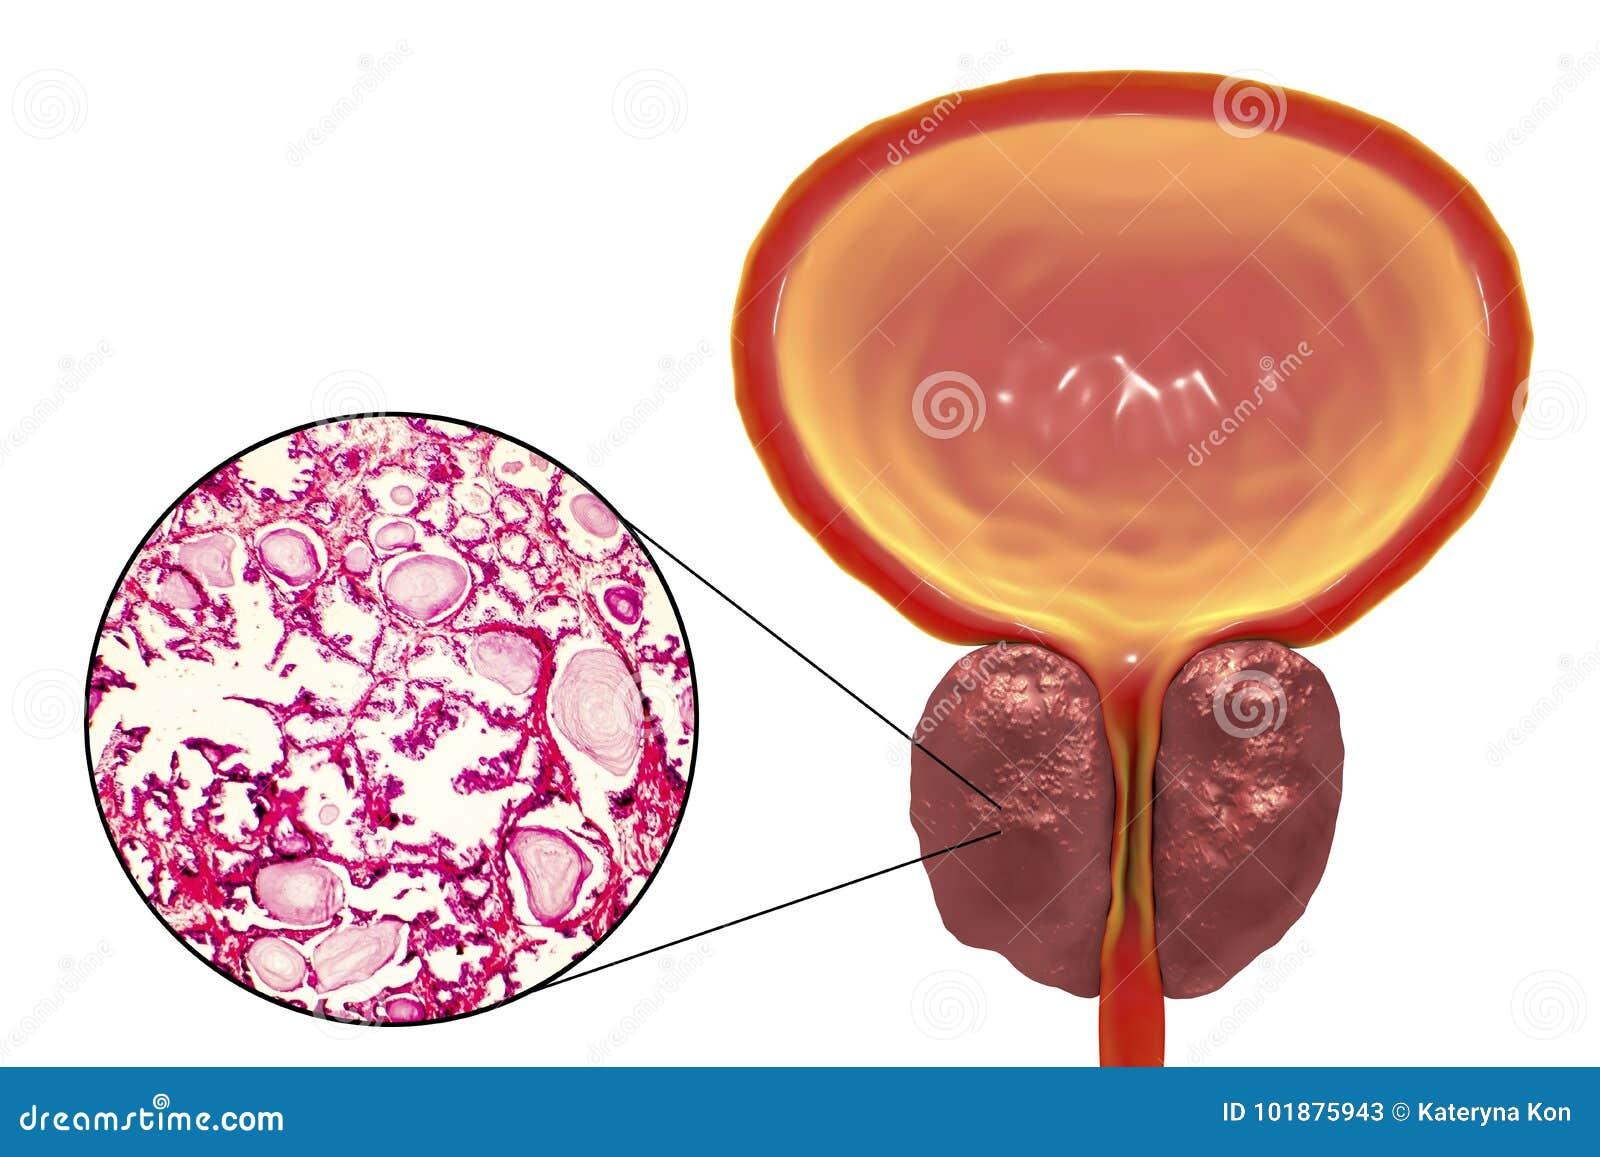 próstata agrandada y vitamina d que